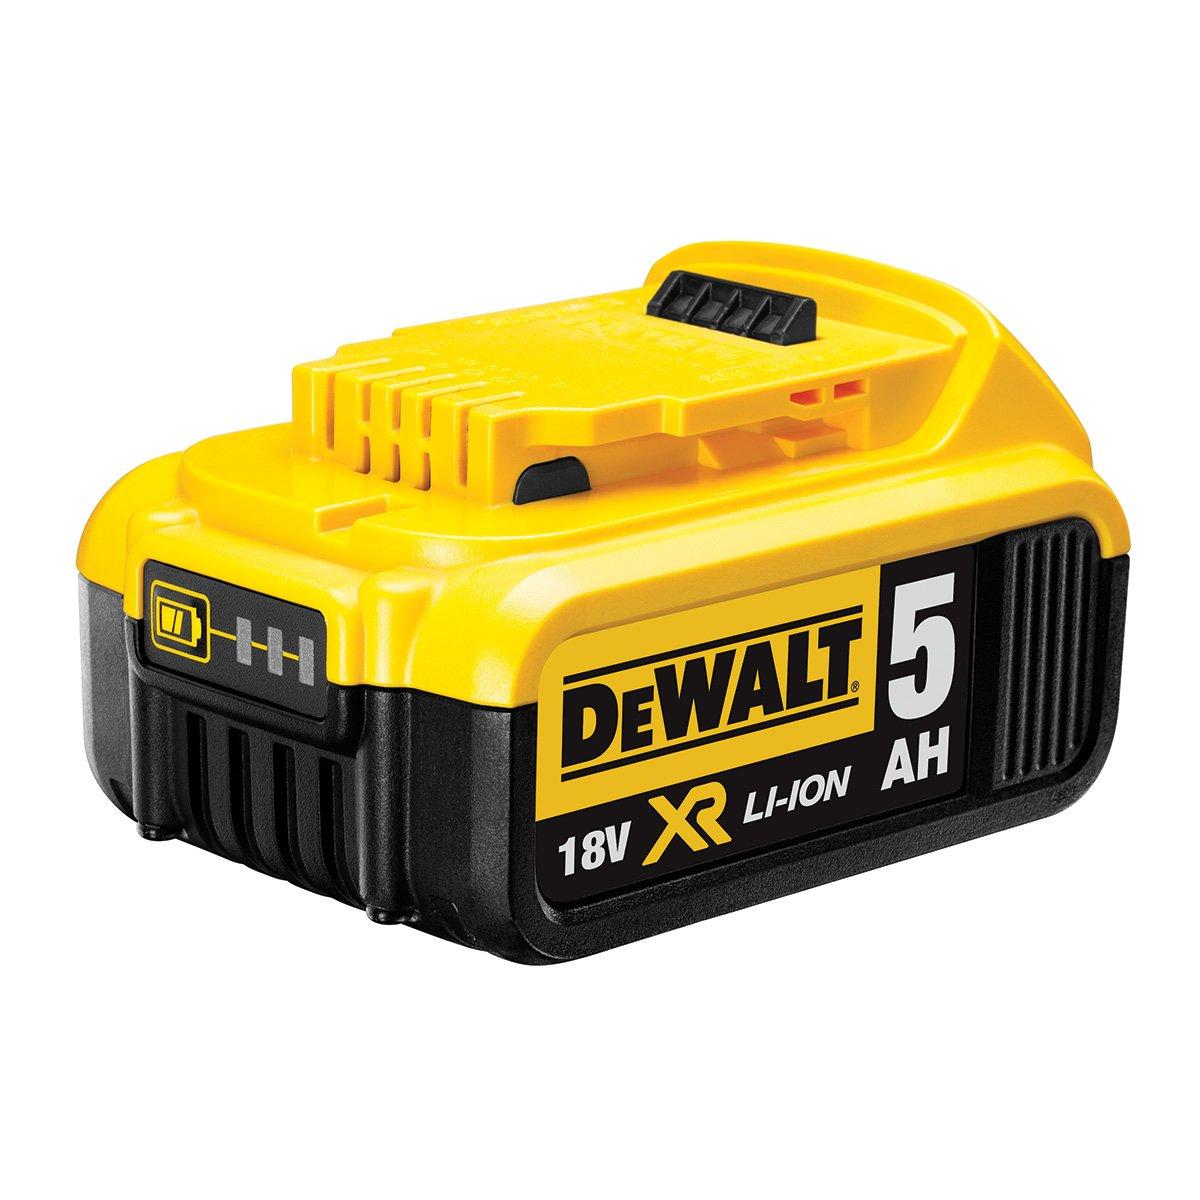 Dewalt DCB184 5.0AH LI-ion XR Slide Pack Battery, 18 V, Black/Yellow DCB184-XJ